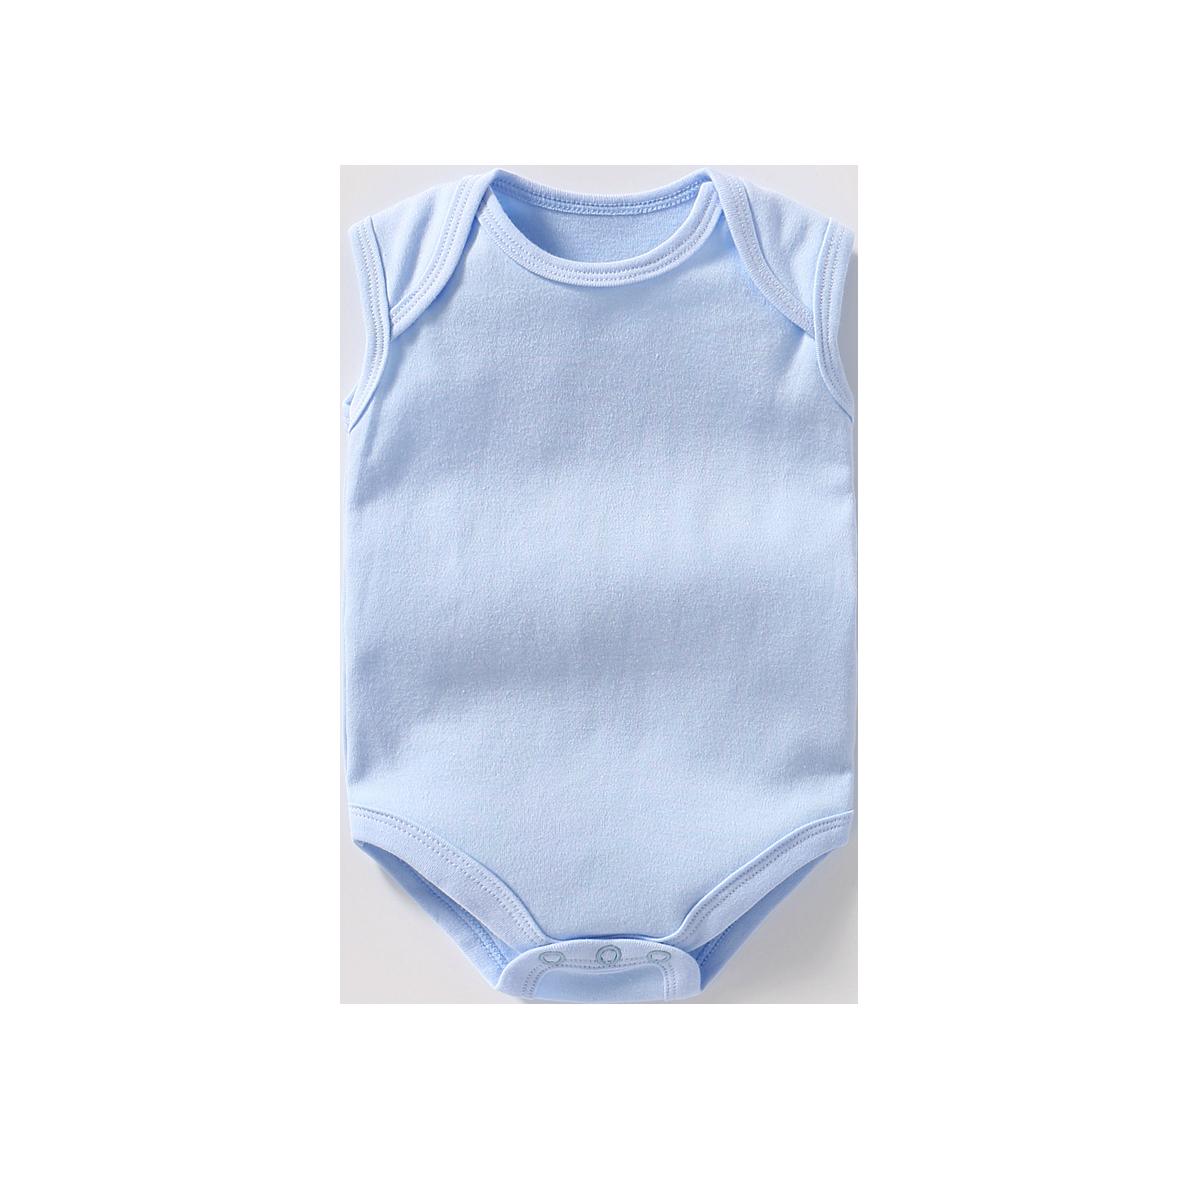 de29b29abd38 Bodysuit body for newborns baby bodysuit body for babies bodysuit baby baby  romper body for children baby body baby girl clothes twins baby girl  bodysuits ...